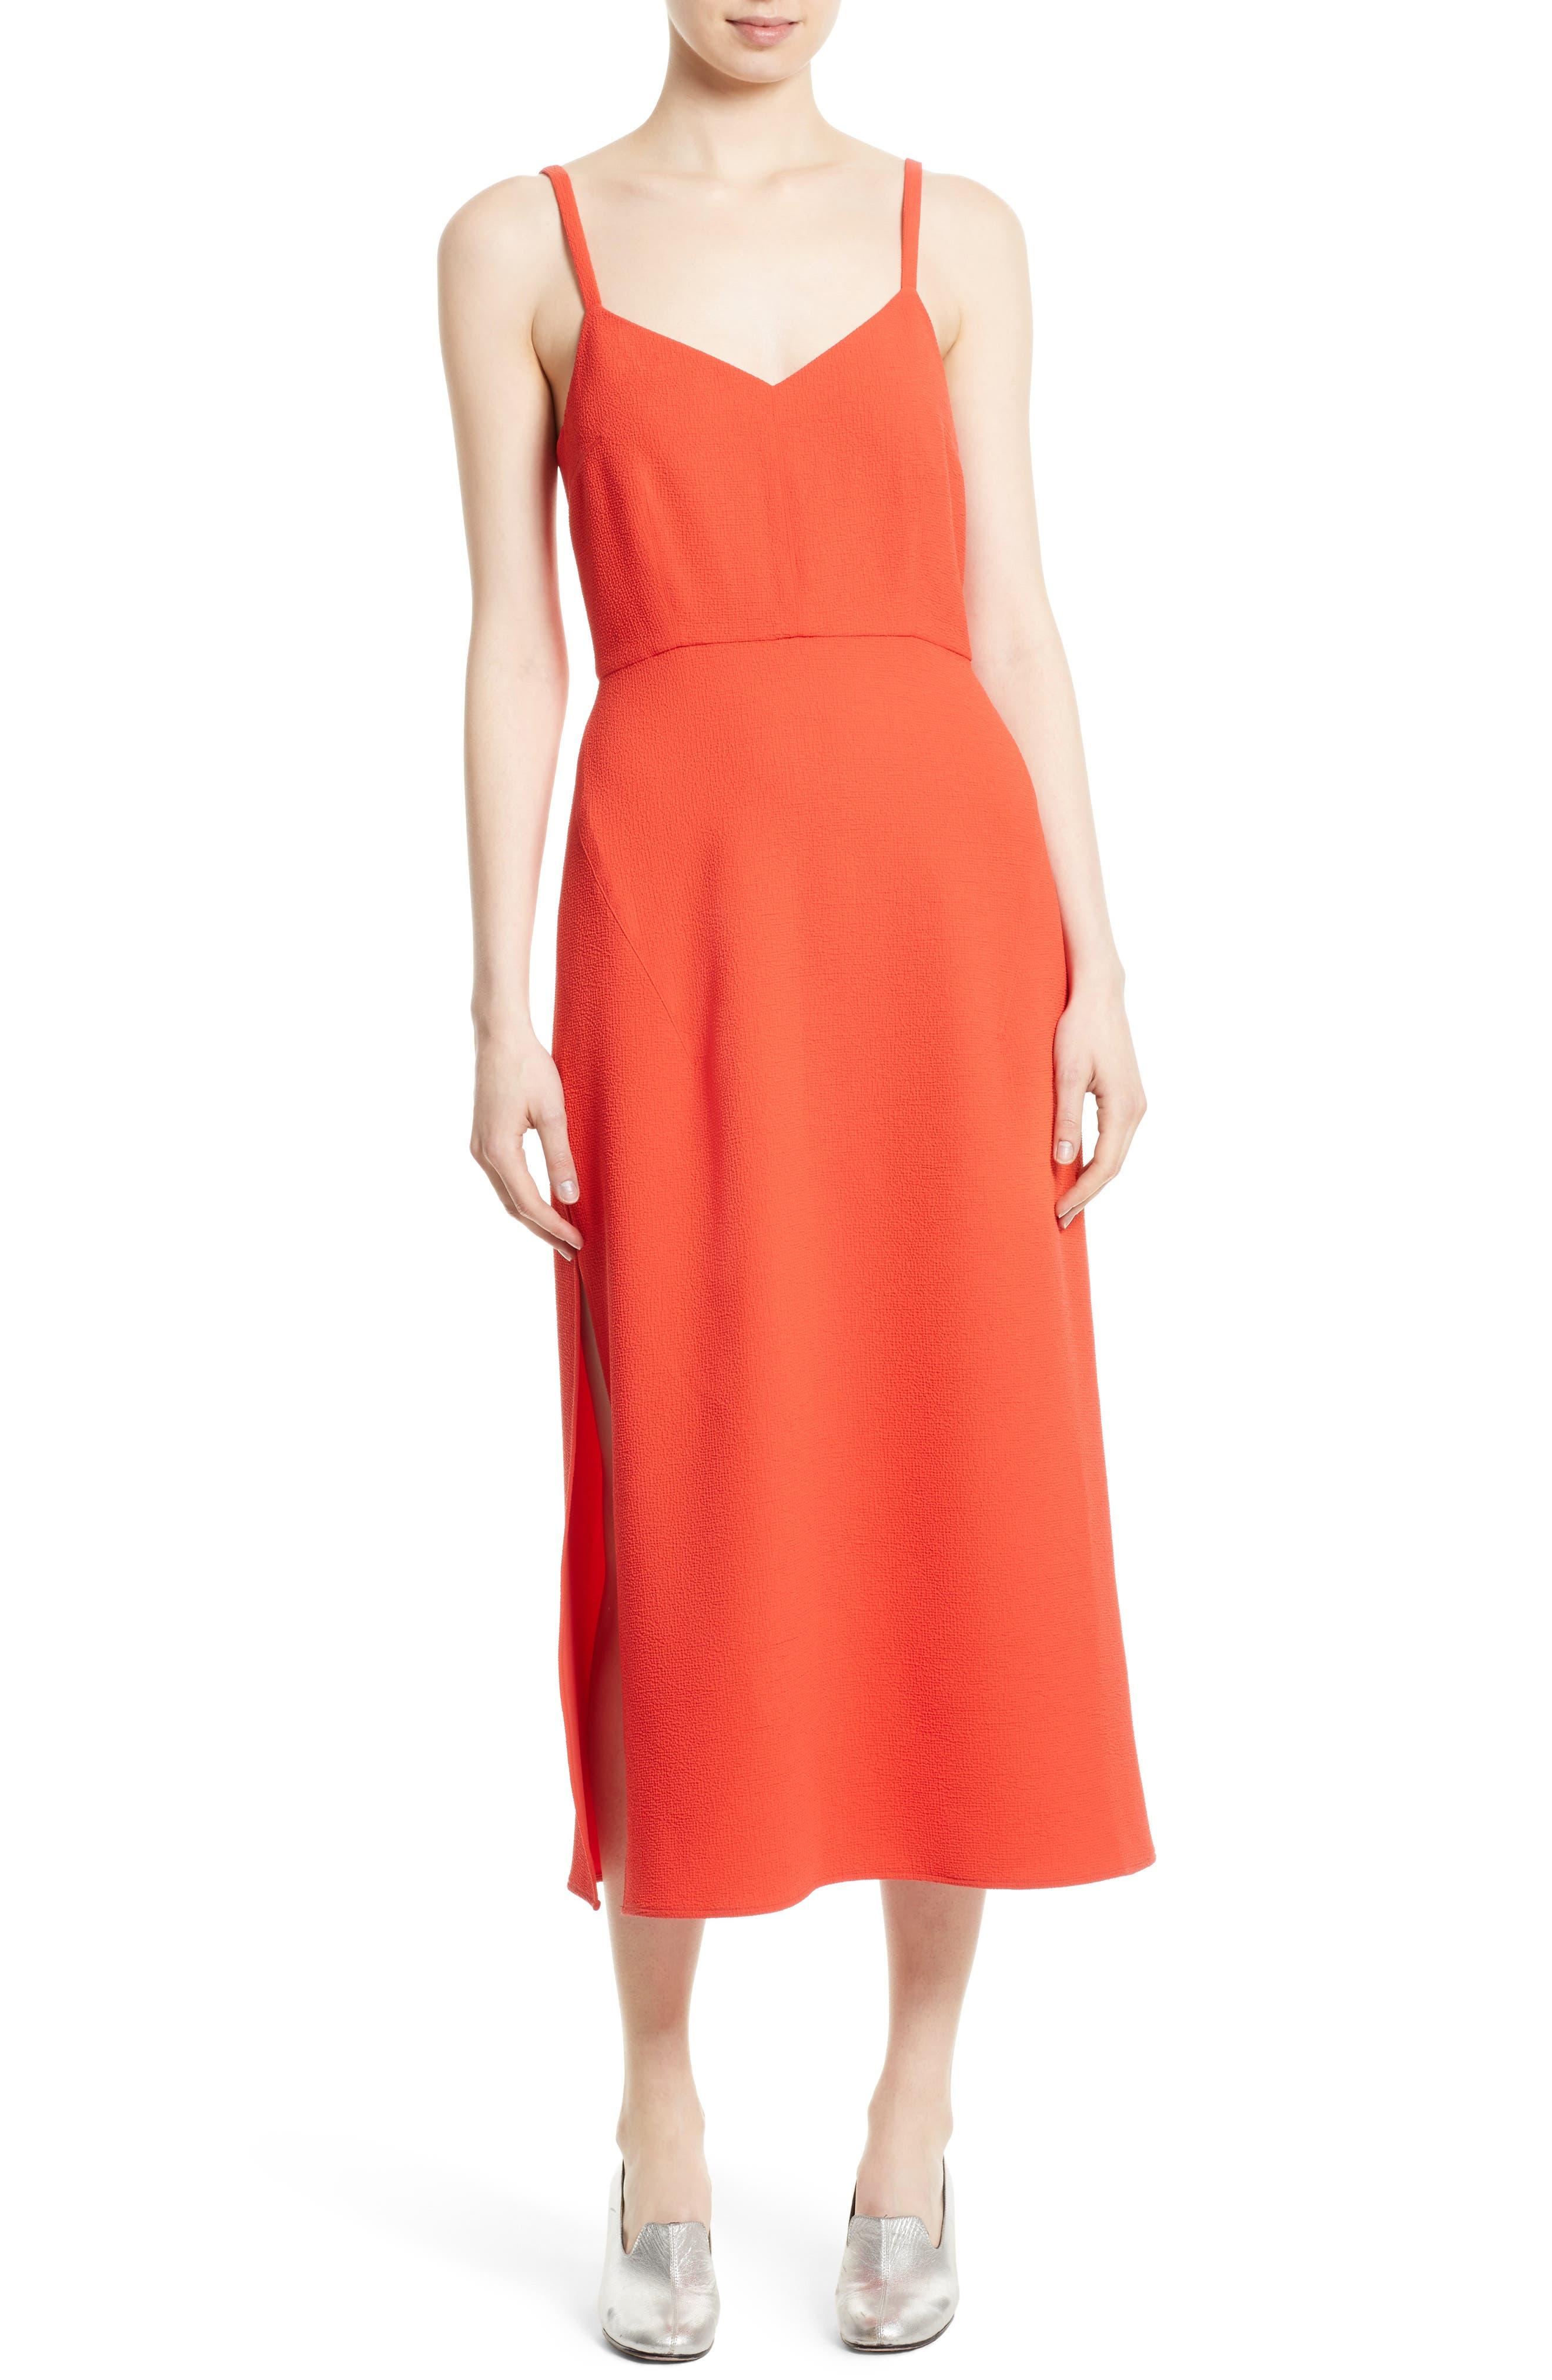 Agitator Midi Dress,                         Main,                         color, 950